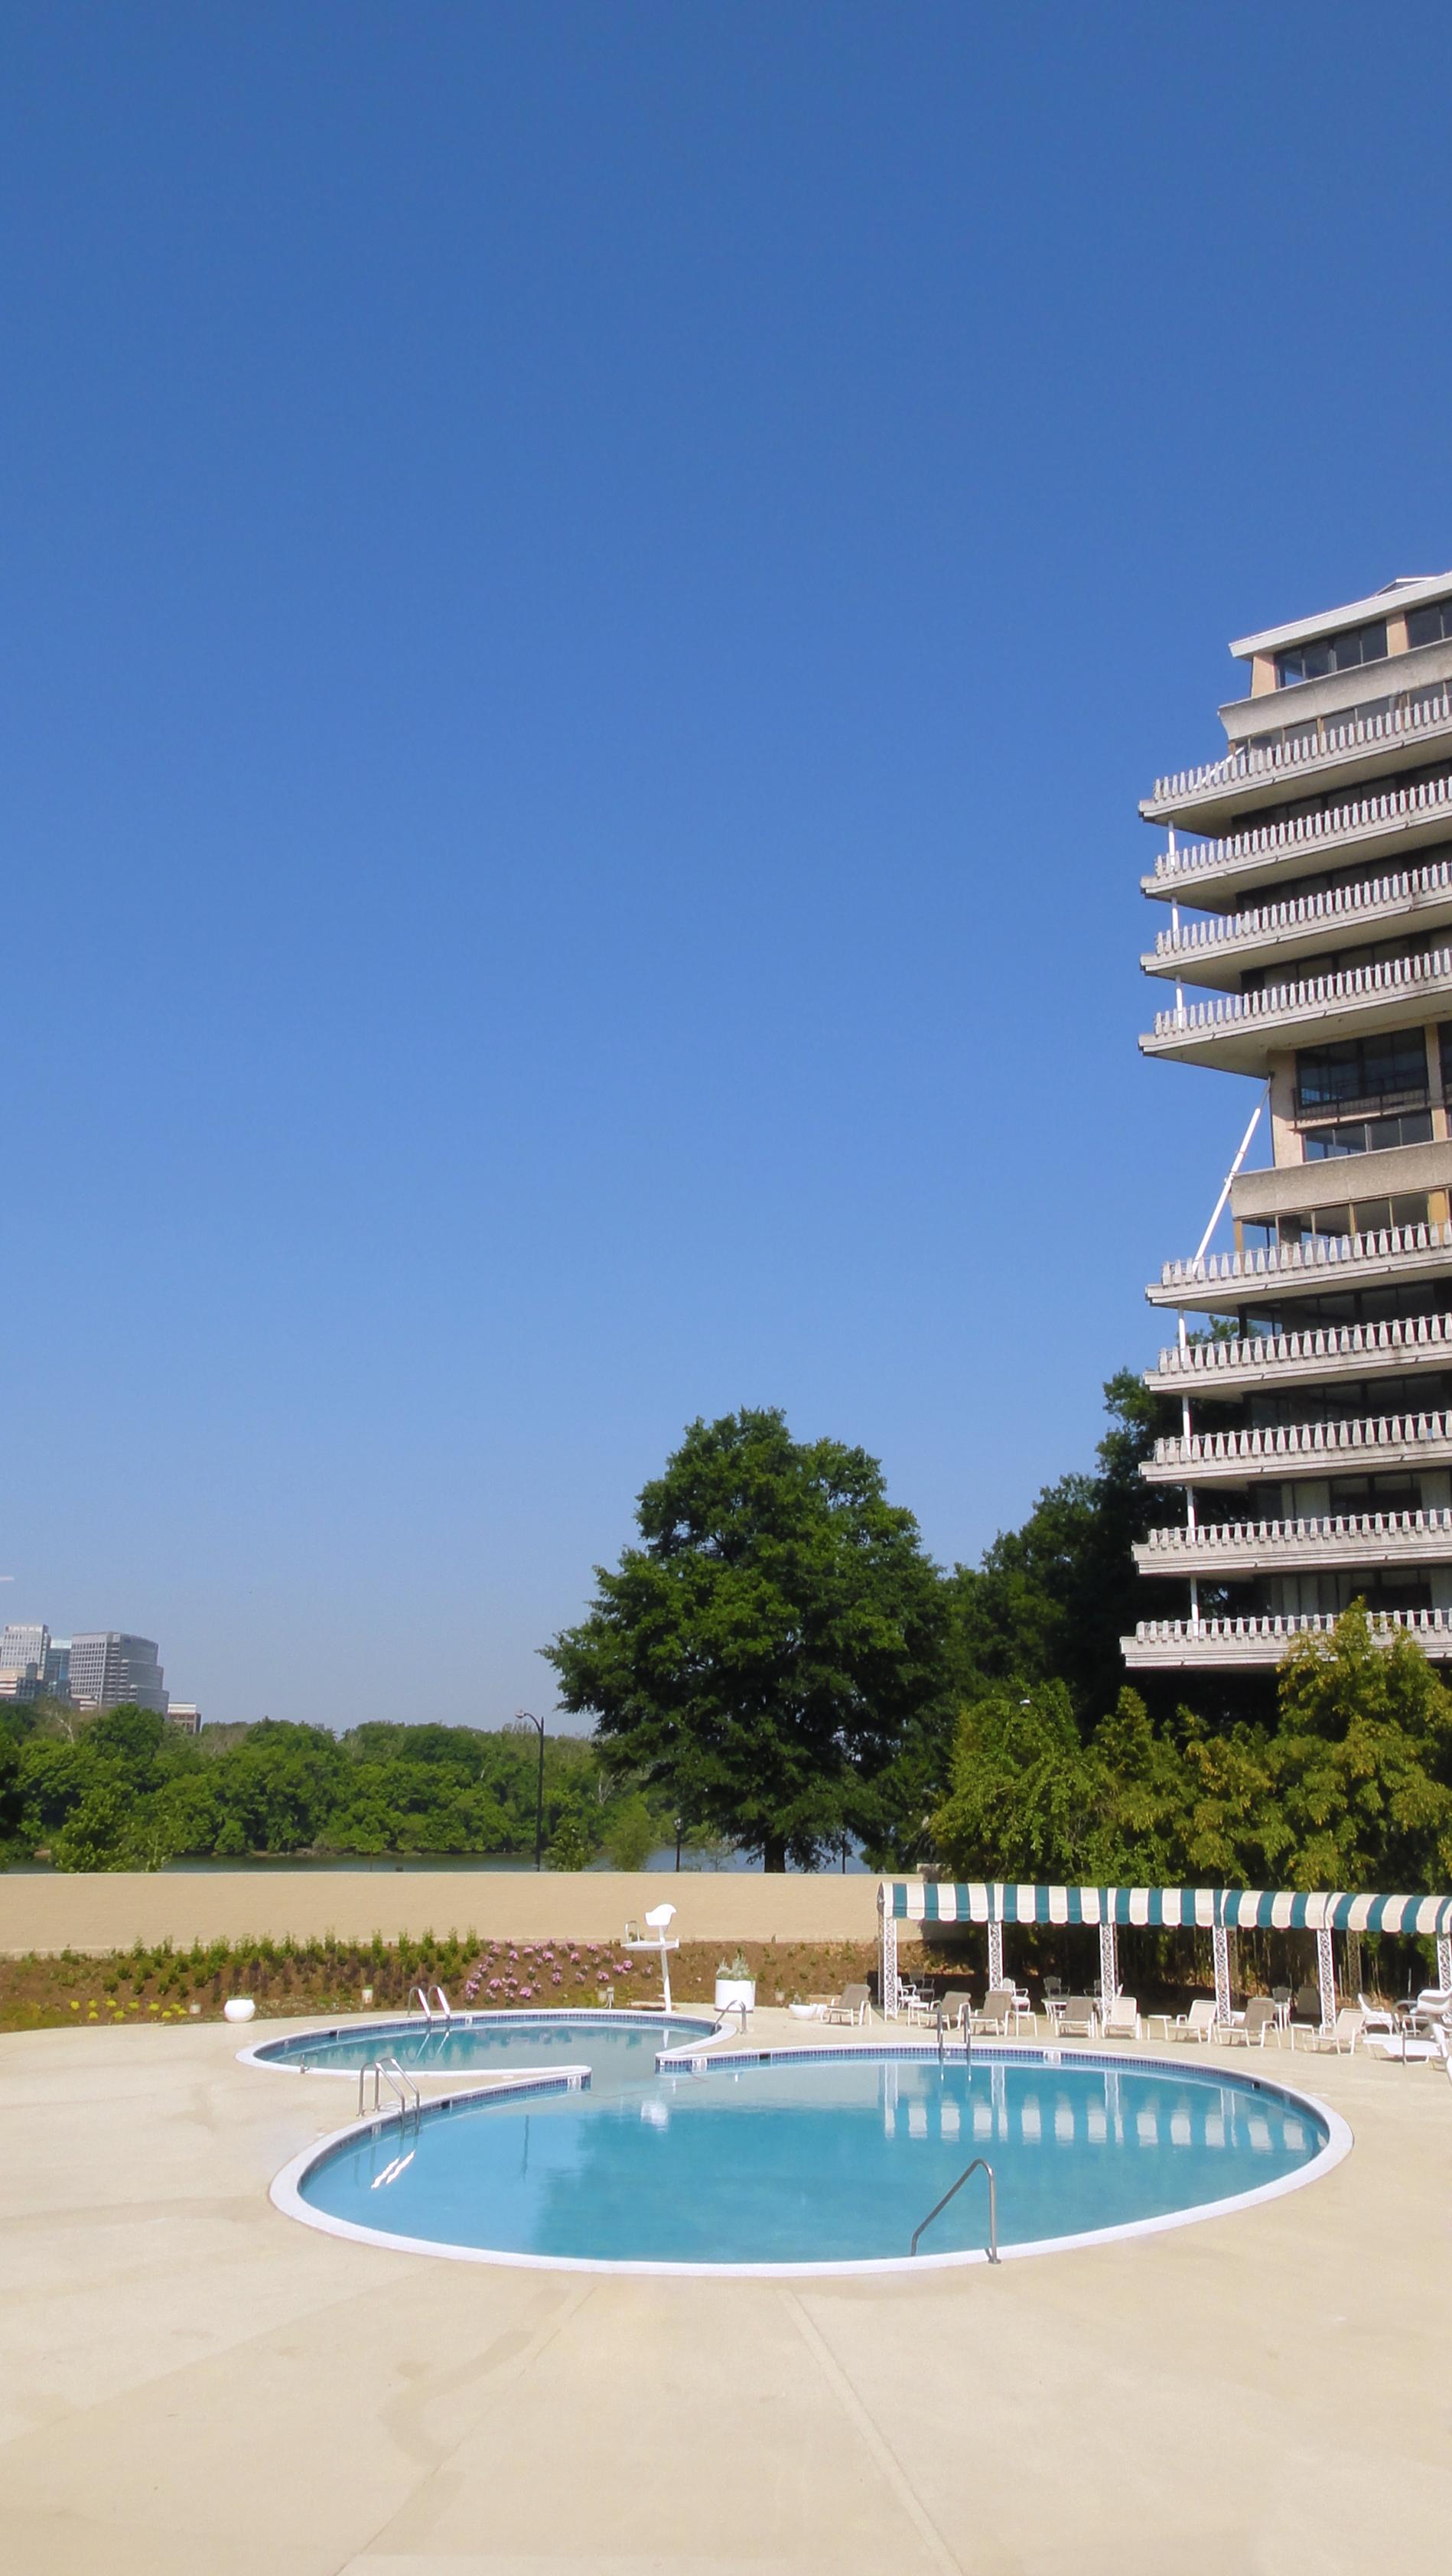 712-N Watergate East